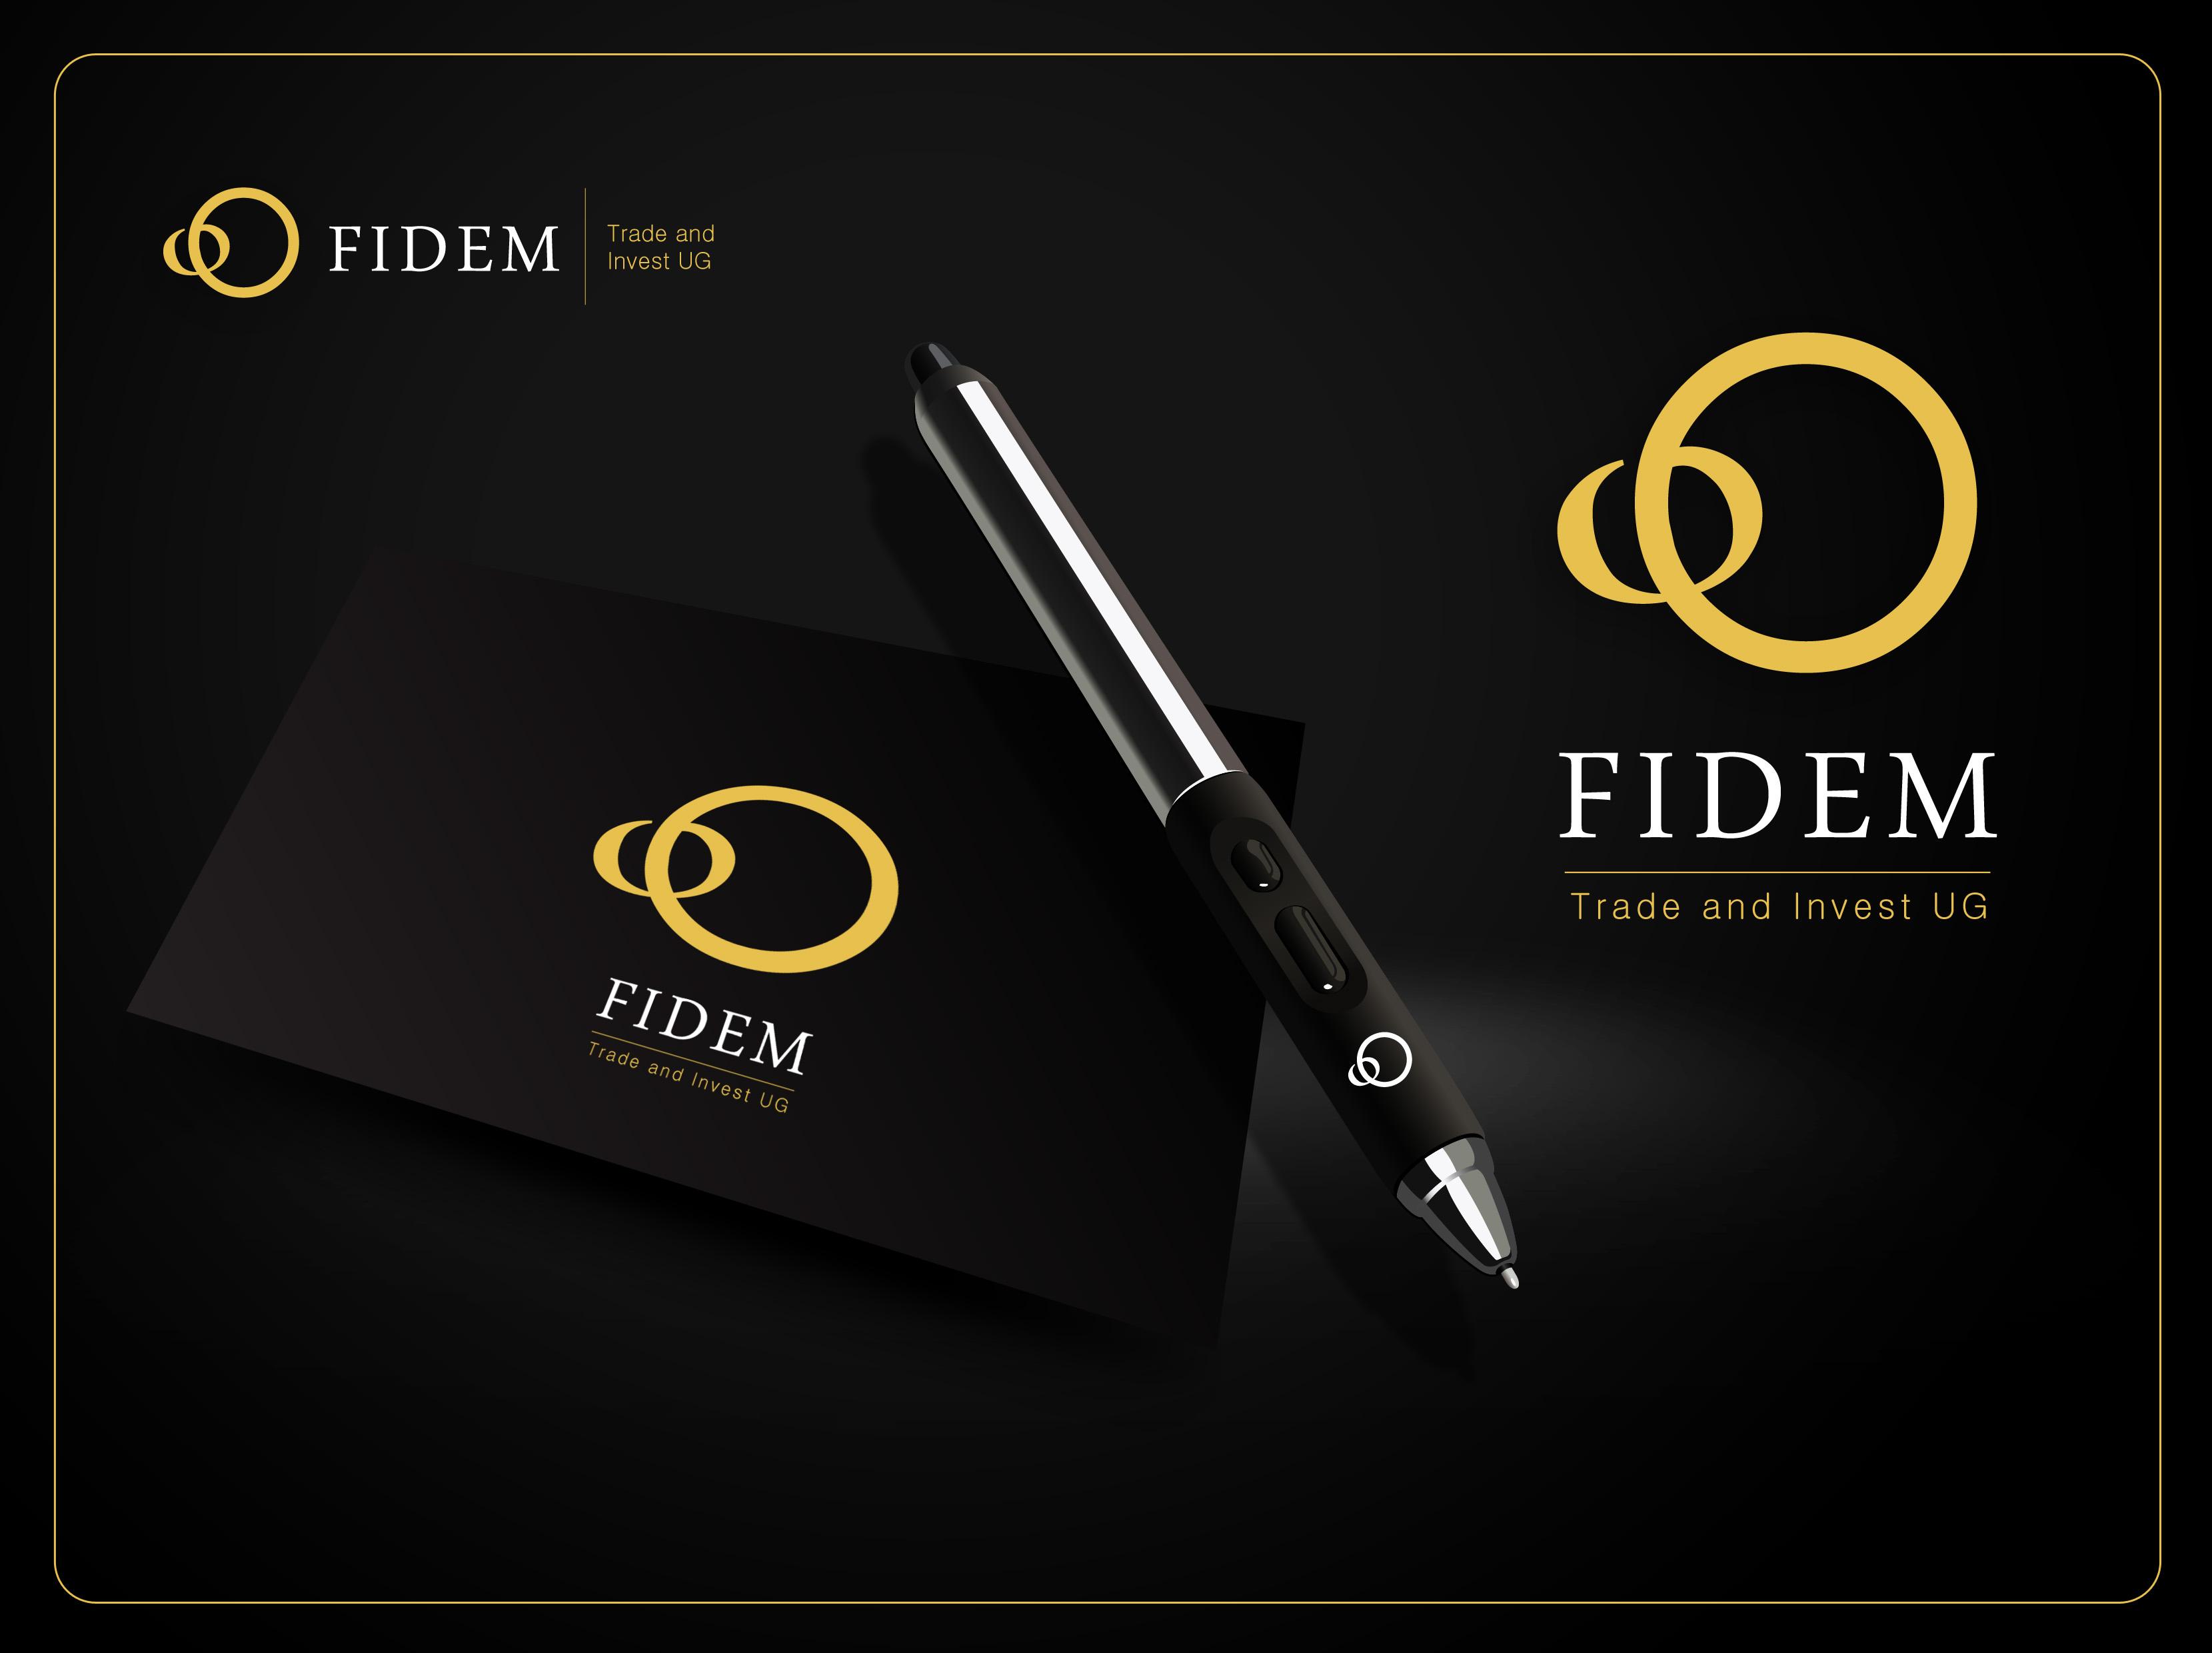 Logo Design by Mark Anthony Moreto Jordan - Entry No. 672 in the Logo Design Contest Professional Logo Design for FIDEM Trade & Invest UG.